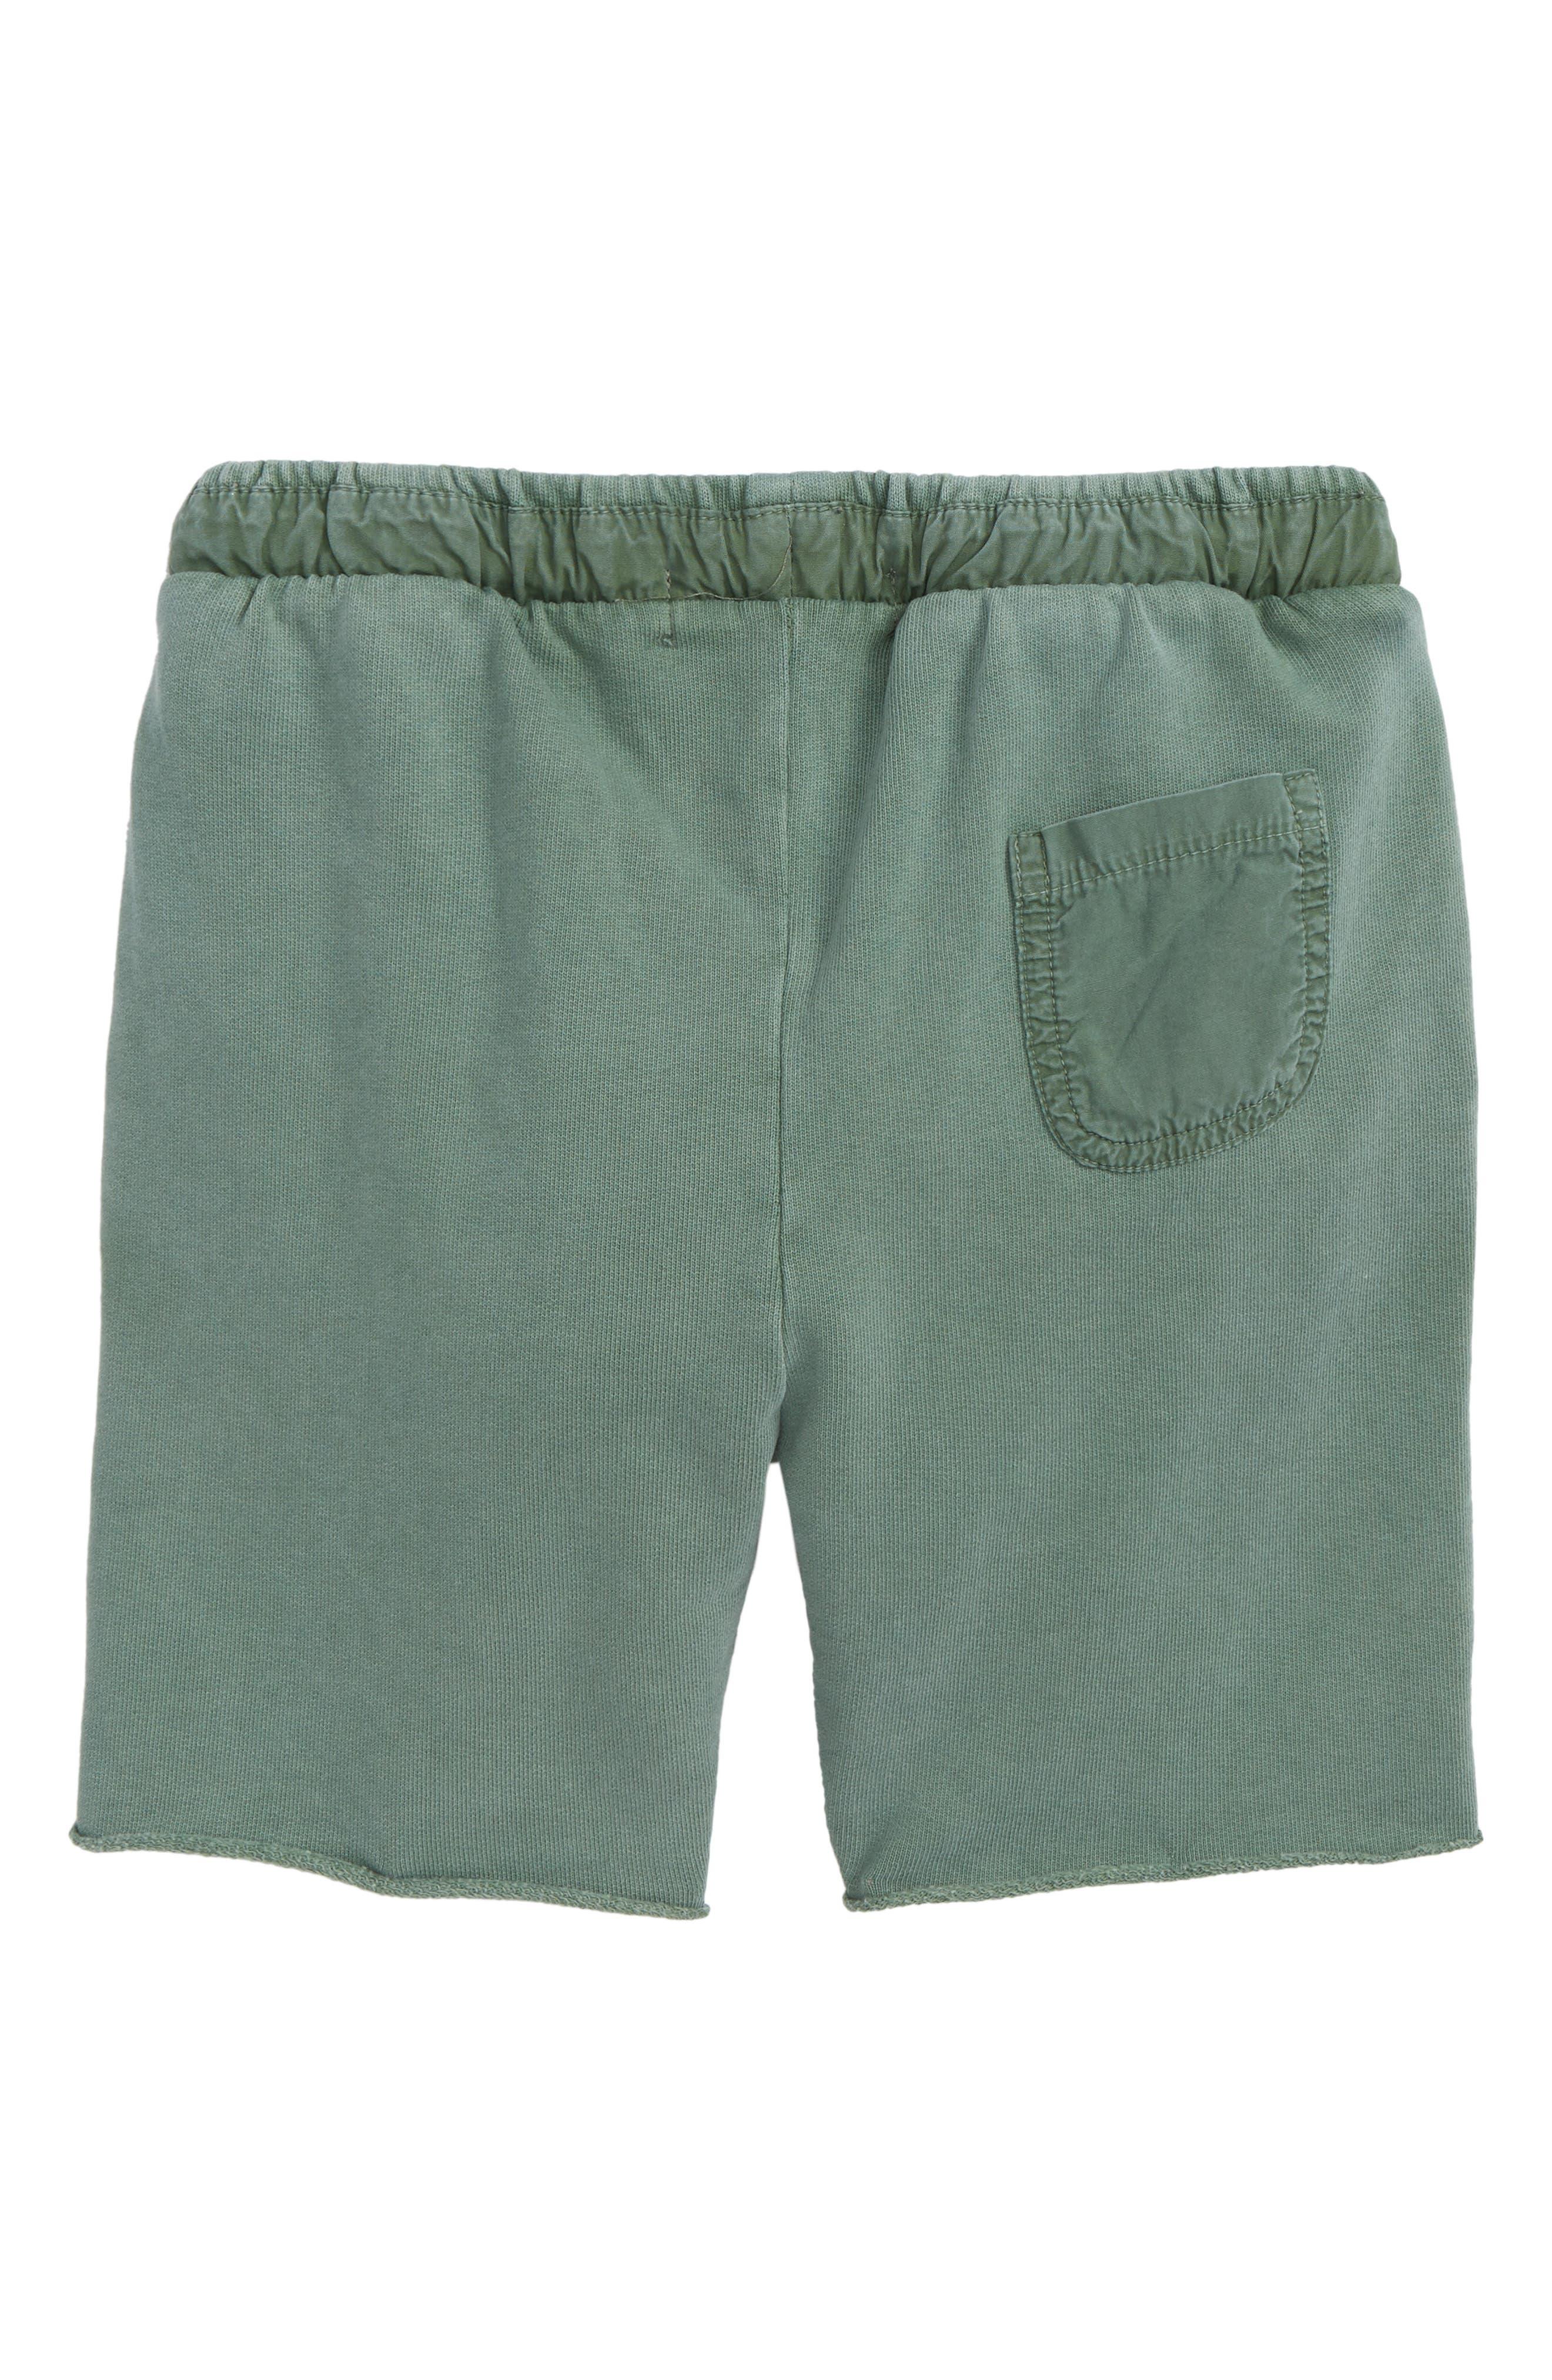 Kids Cullen Organic Cotton Shorts,                             Alternate thumbnail 2, color,